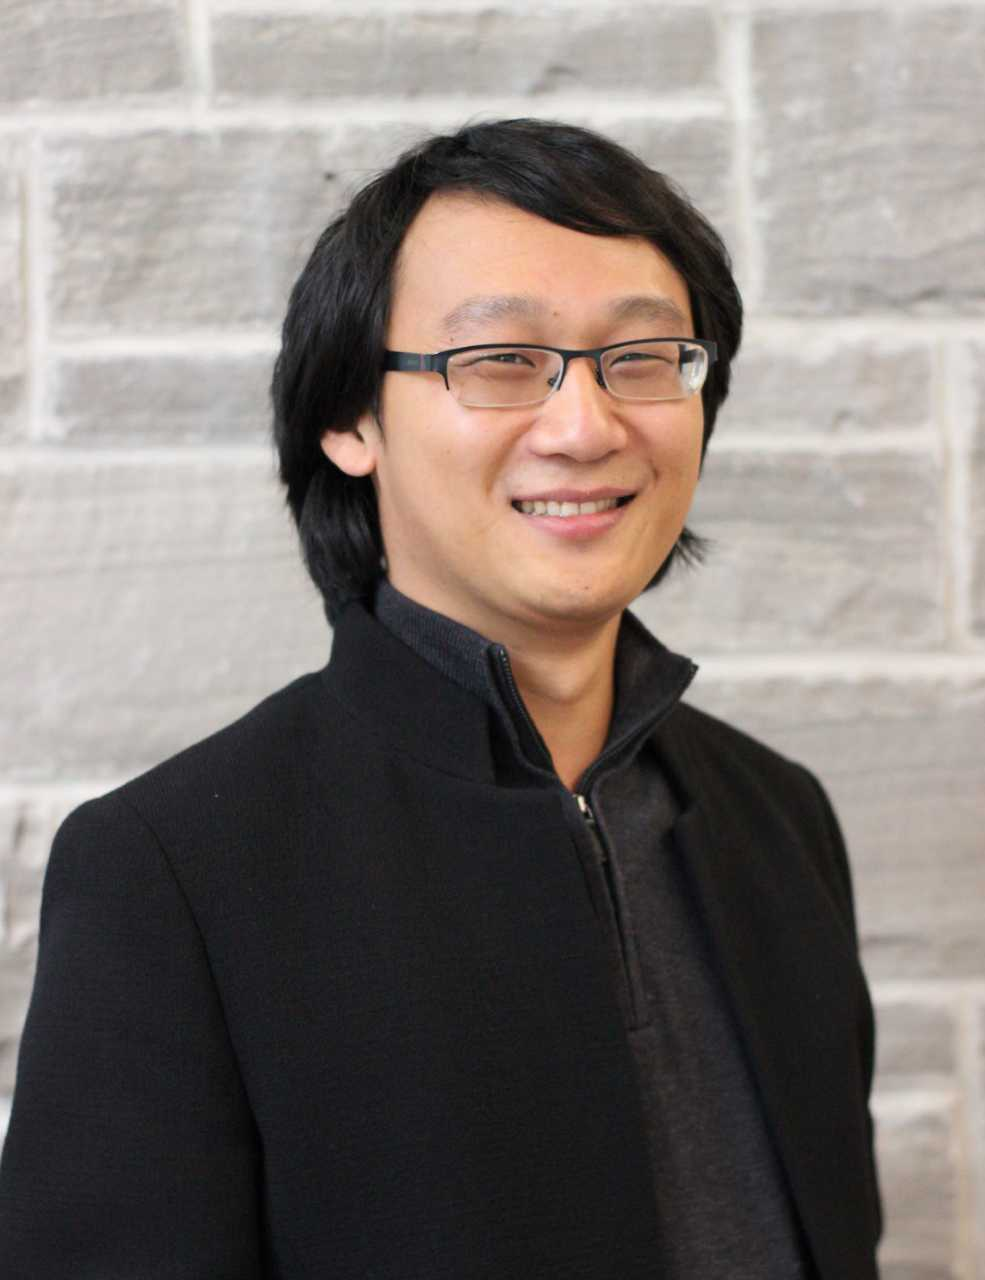 Yimin Chen, LIS PhD